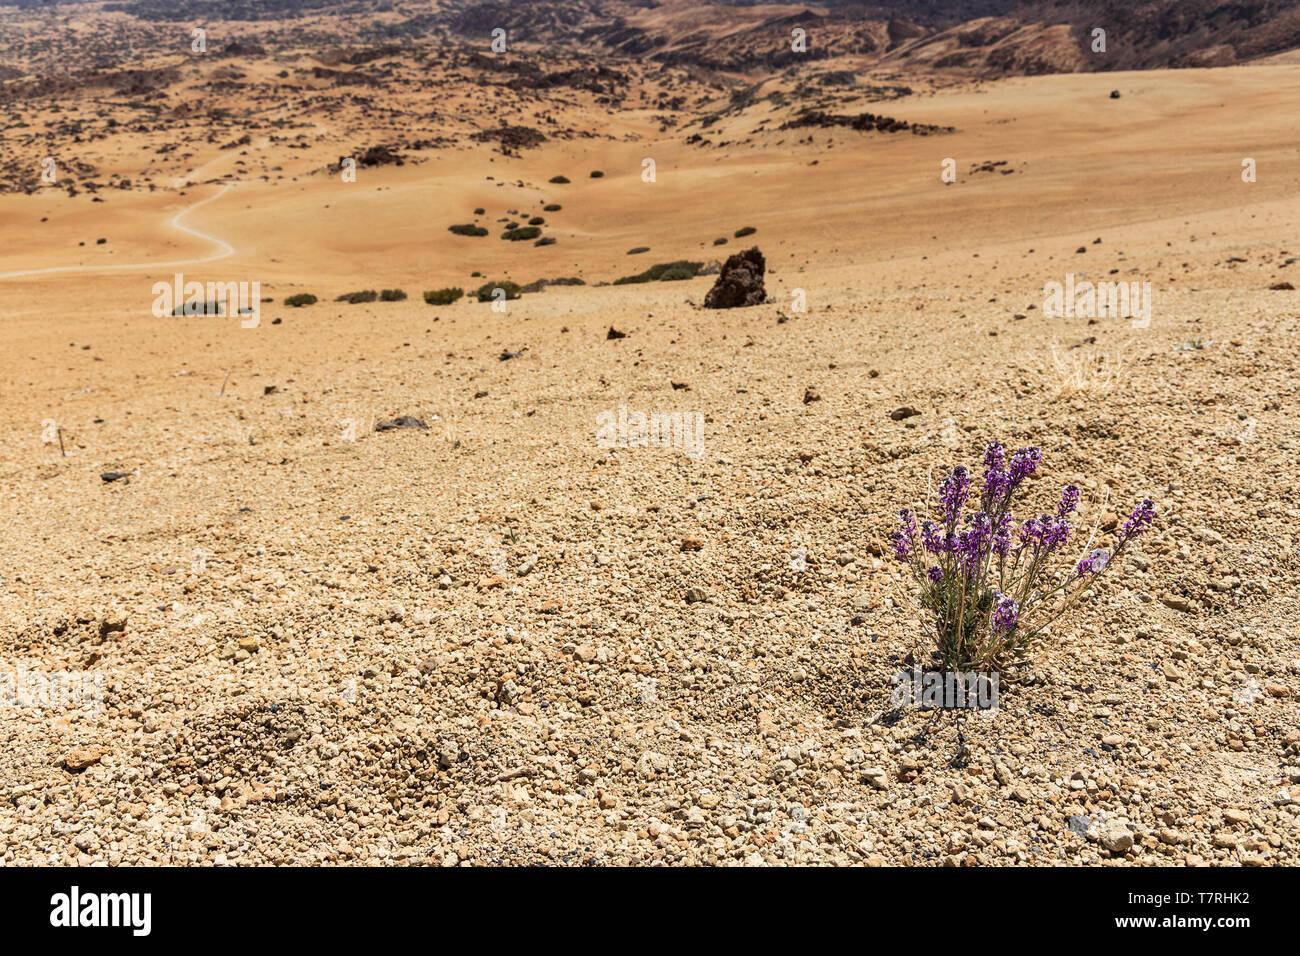 Erysimum scoparium, Alheli del Teide, Kanarische Mauerblümchen, Montaña Blanca, Las Cañadas del Teide, Teneriffa, Kanarische Inseln, Spanien Stockbild